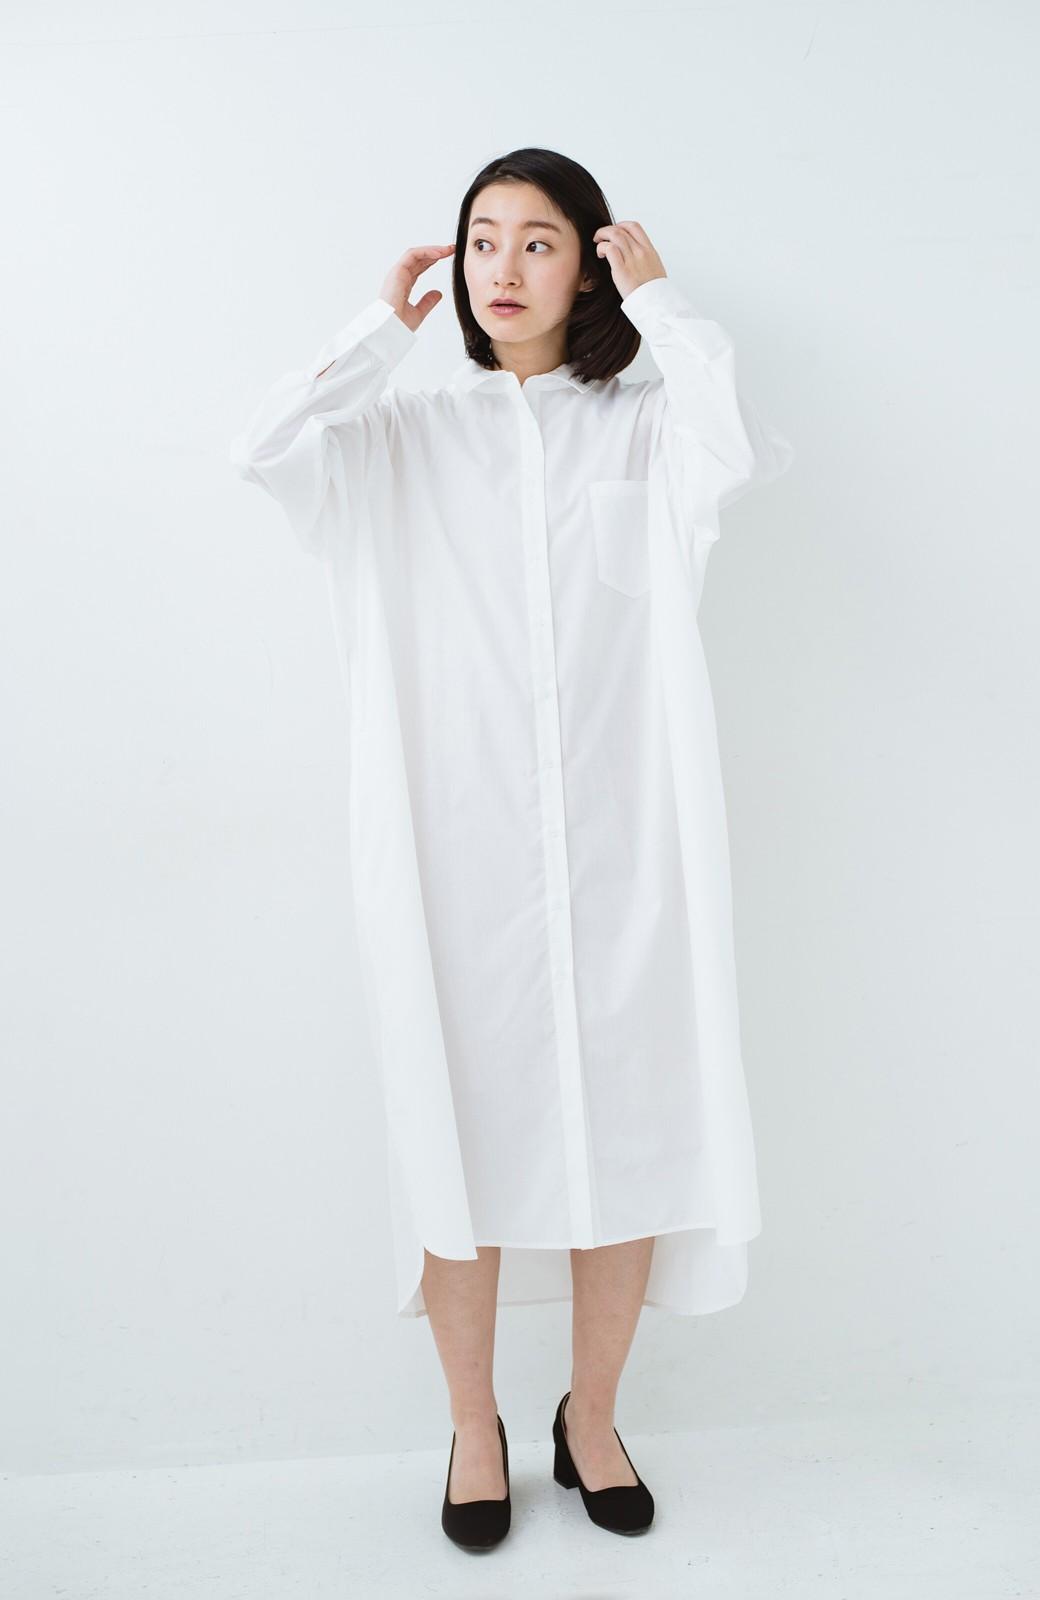 haco! 気持ちが凛と改まる リボン付きオーバーサイズシャツワンピース <ホワイト>の商品写真9